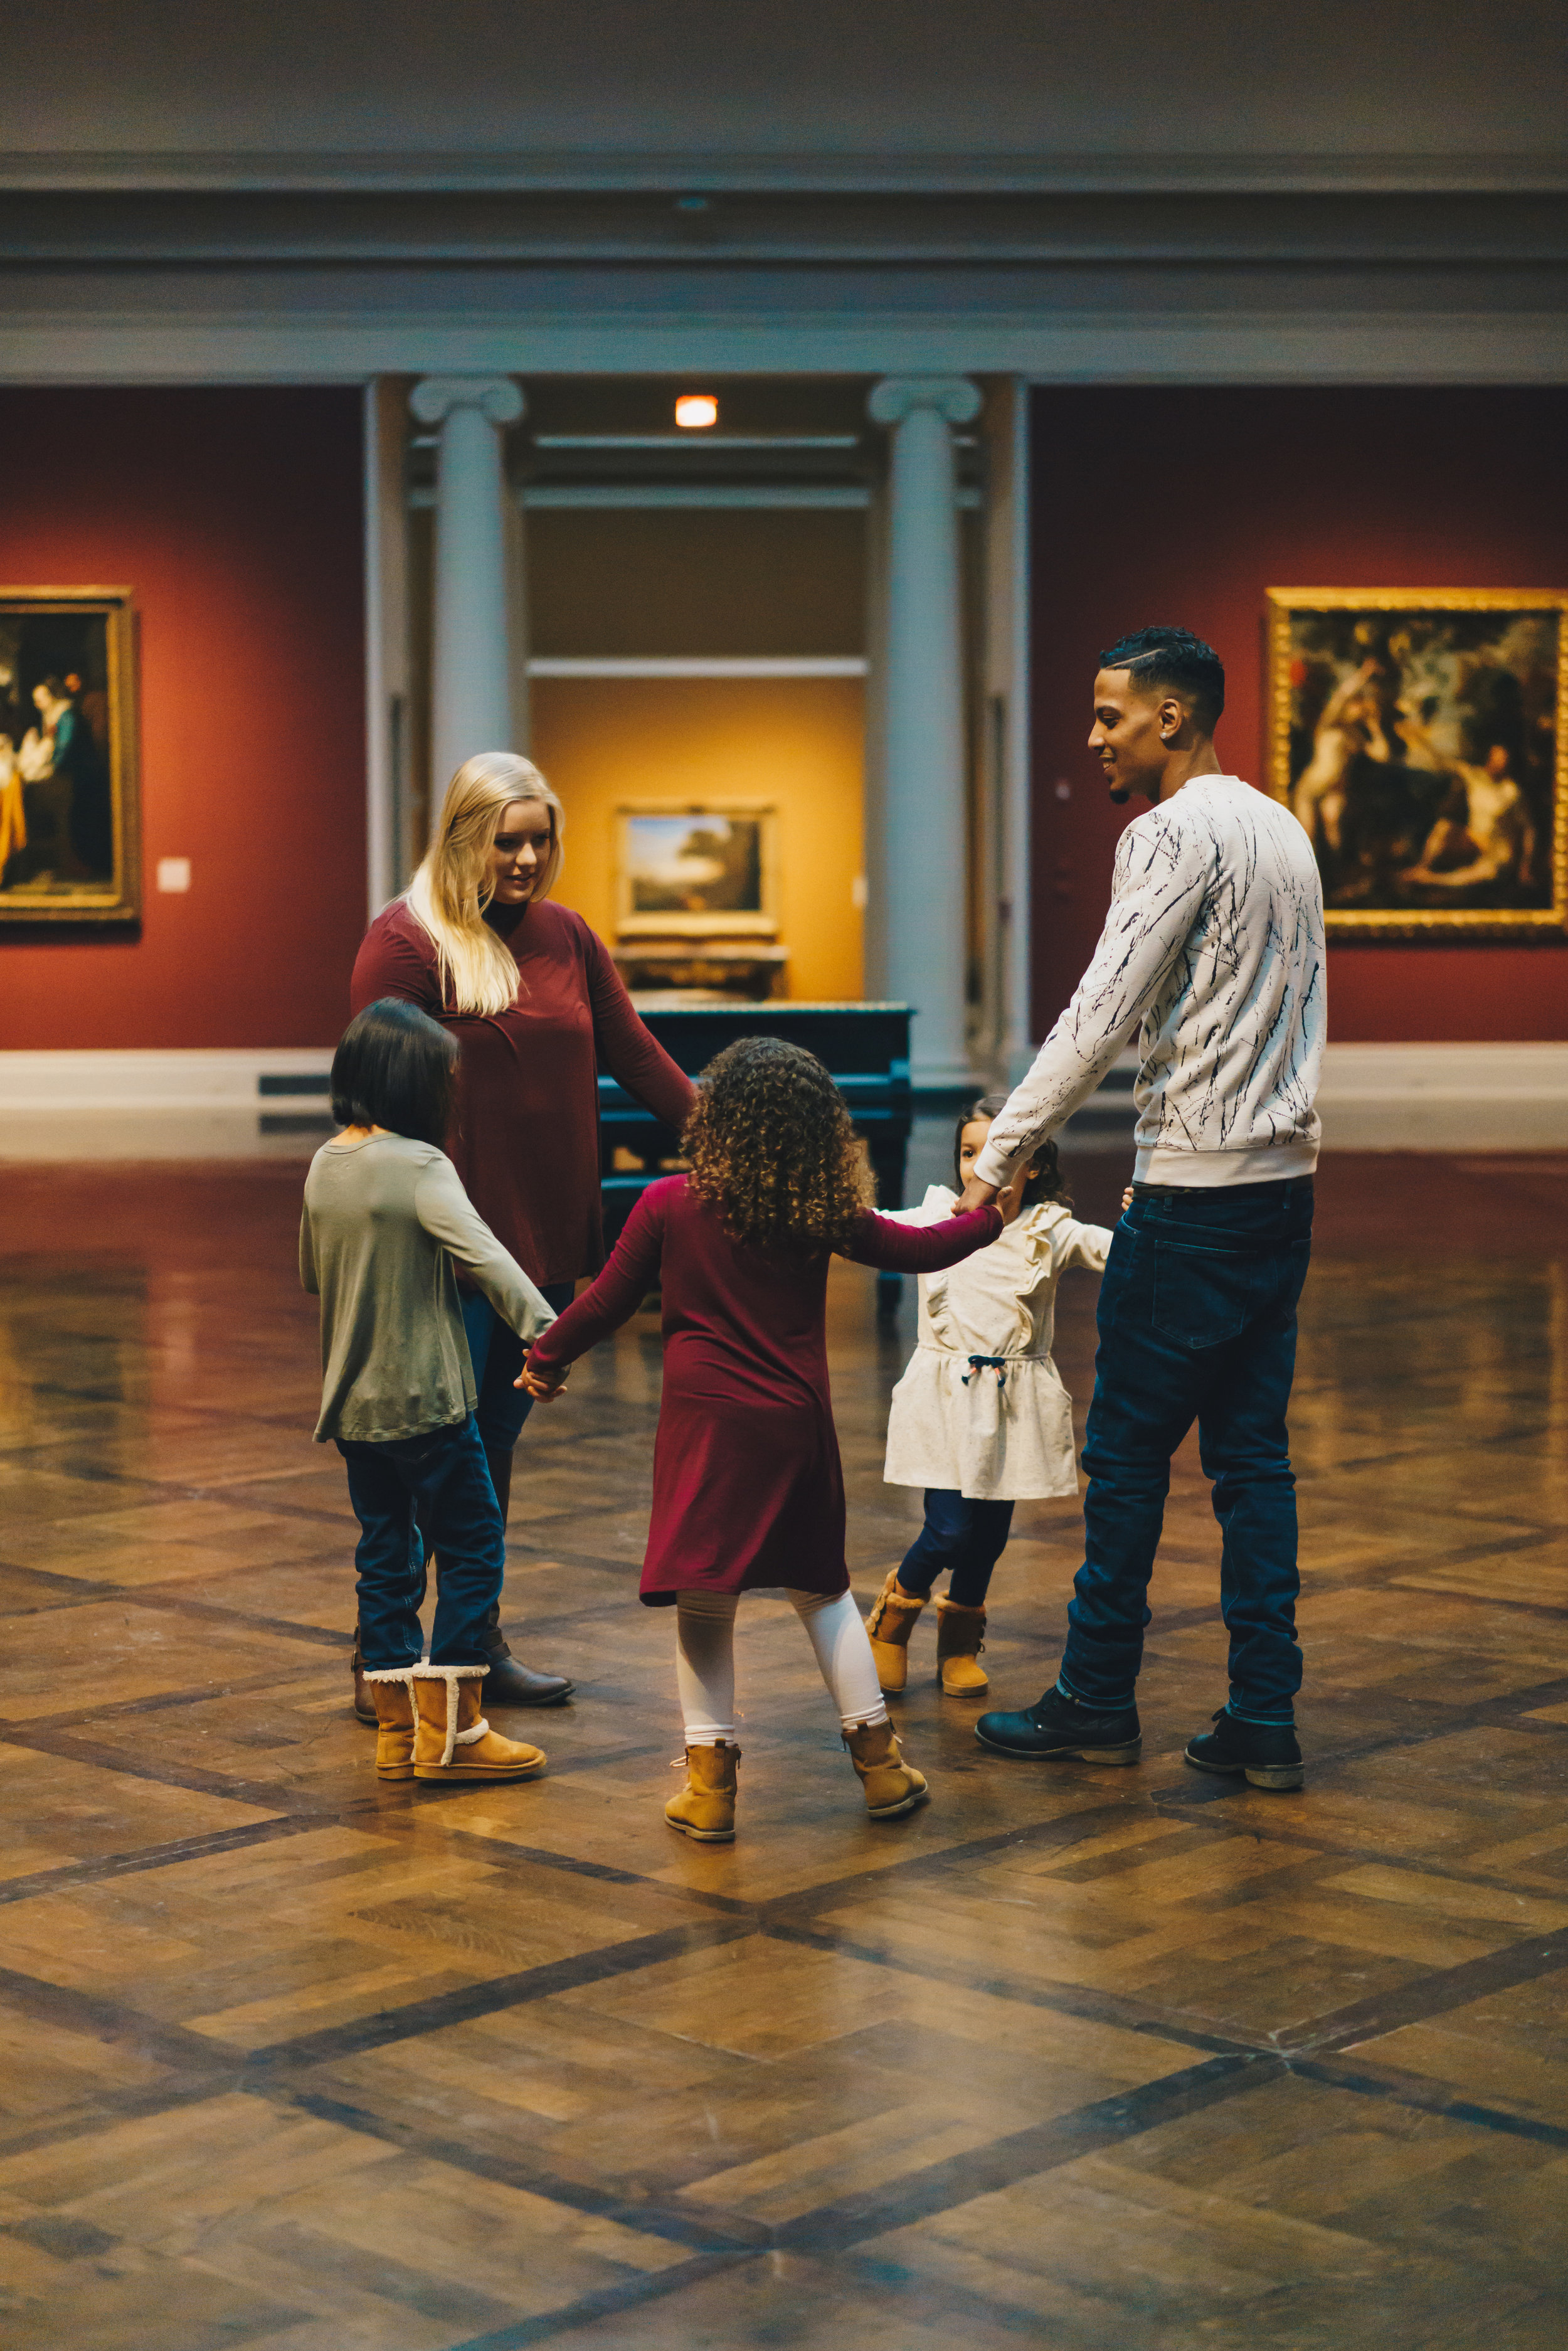 Nashville Tennessee Photographer- Art Museum Family Session 2